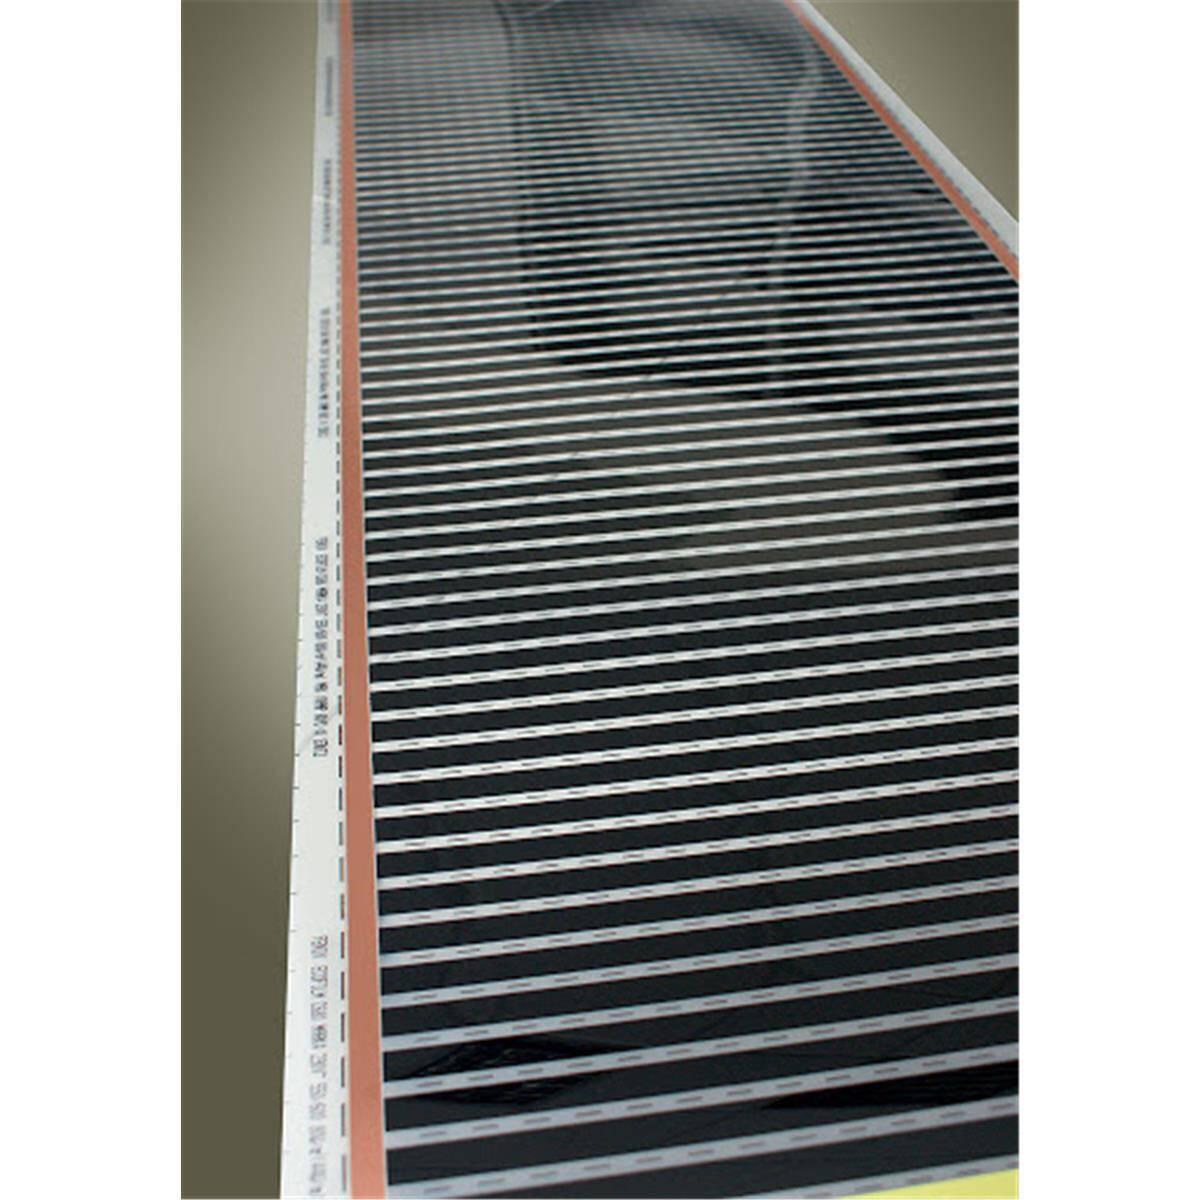 Relativ elektrische Fußbodenheizung ecofilm 80-100, 57,00 € RA74